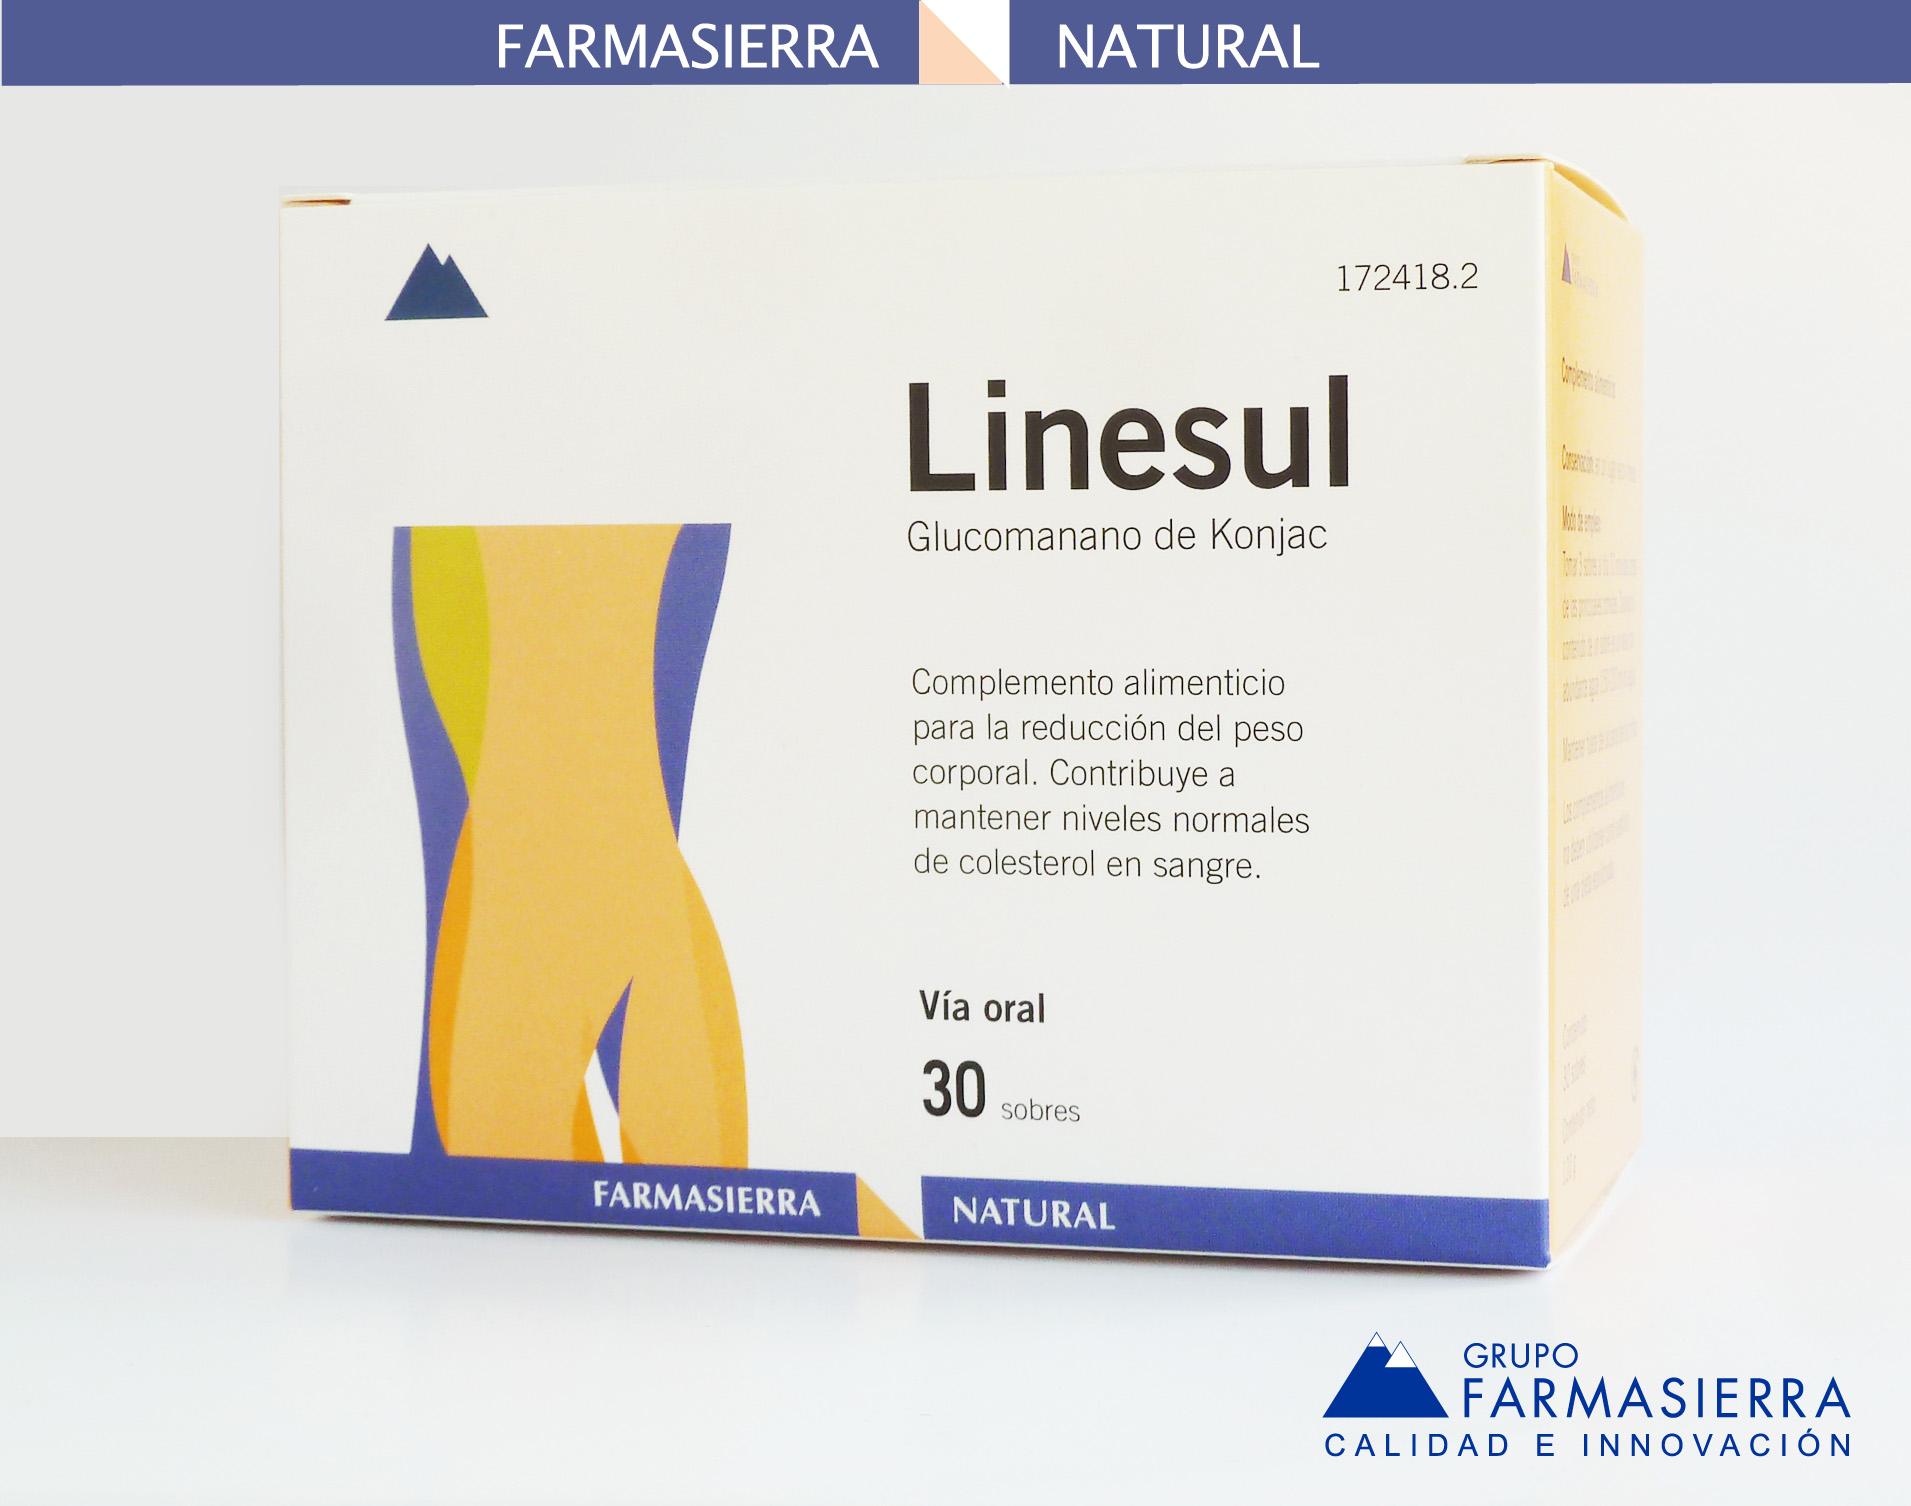 Farmasierra - Linesul